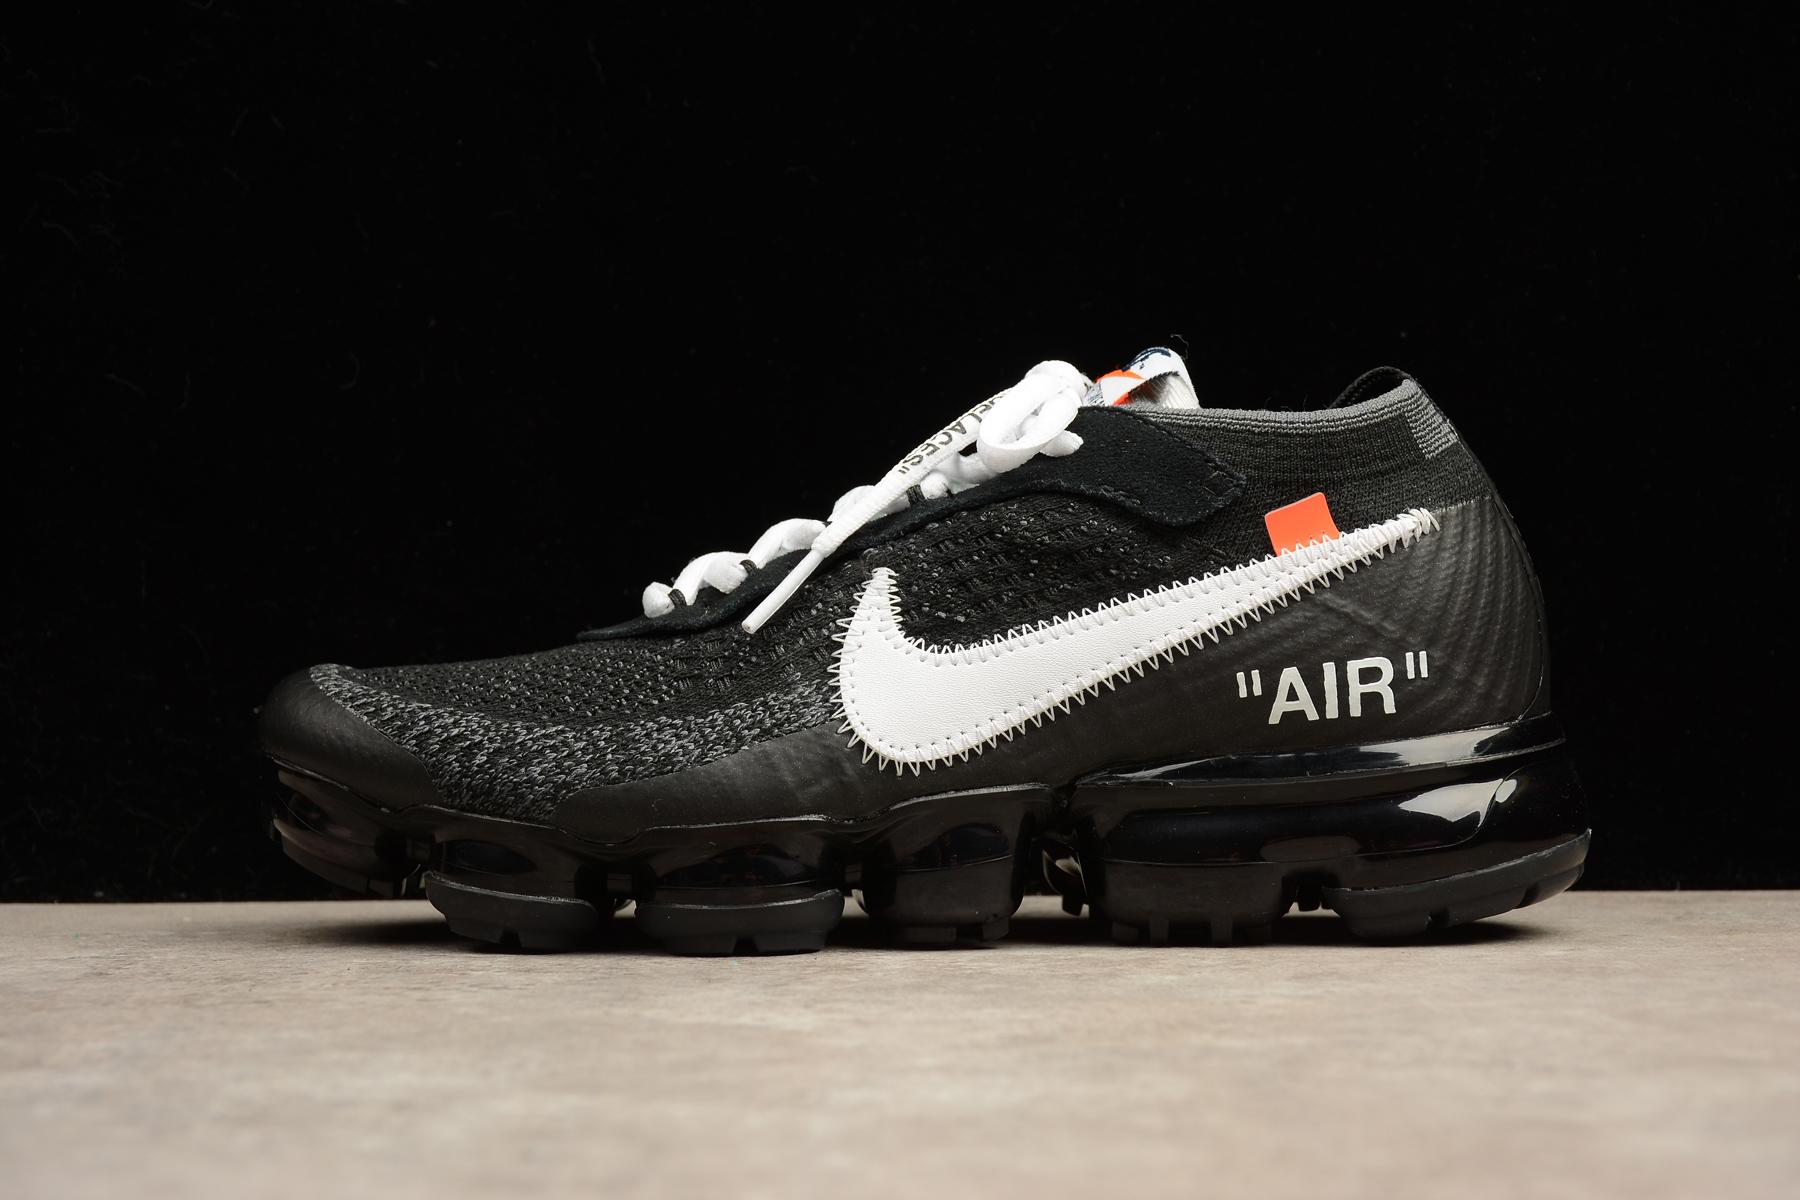 6a4965f68e Prev 2018 Off White X Nike Air Max Vapormax Men Running Shoes Black AA3831- 001. Zoom